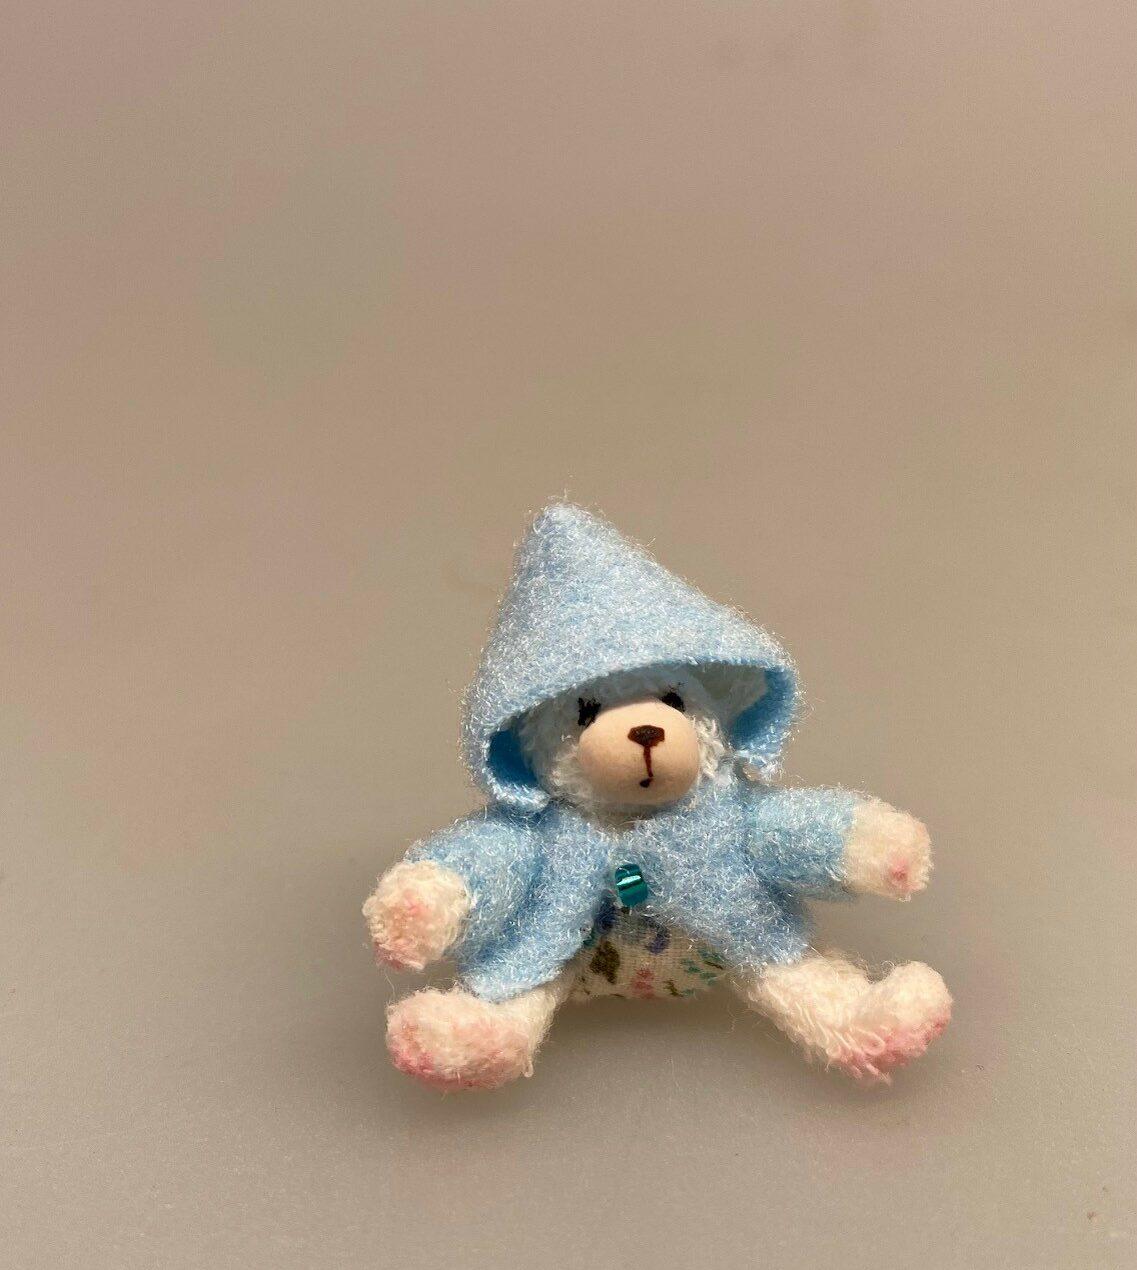 Miniature Plys Bamse med lyseblå trøje, bamse, mikro, miniature, bjørn, teddy, plysbjørn, paddington, peter plys, bamsebjørn, legetøj, krammebamse, sætterkasse, sættekasse, ting til, dukkehuset, børneværelset, dukkehus, dukkestue, nisser, nissebo, nissedør, sangskjuler, barnedåb, symbolsk, gaveide, gavekort, sjov, kigkasse, biti, ribe